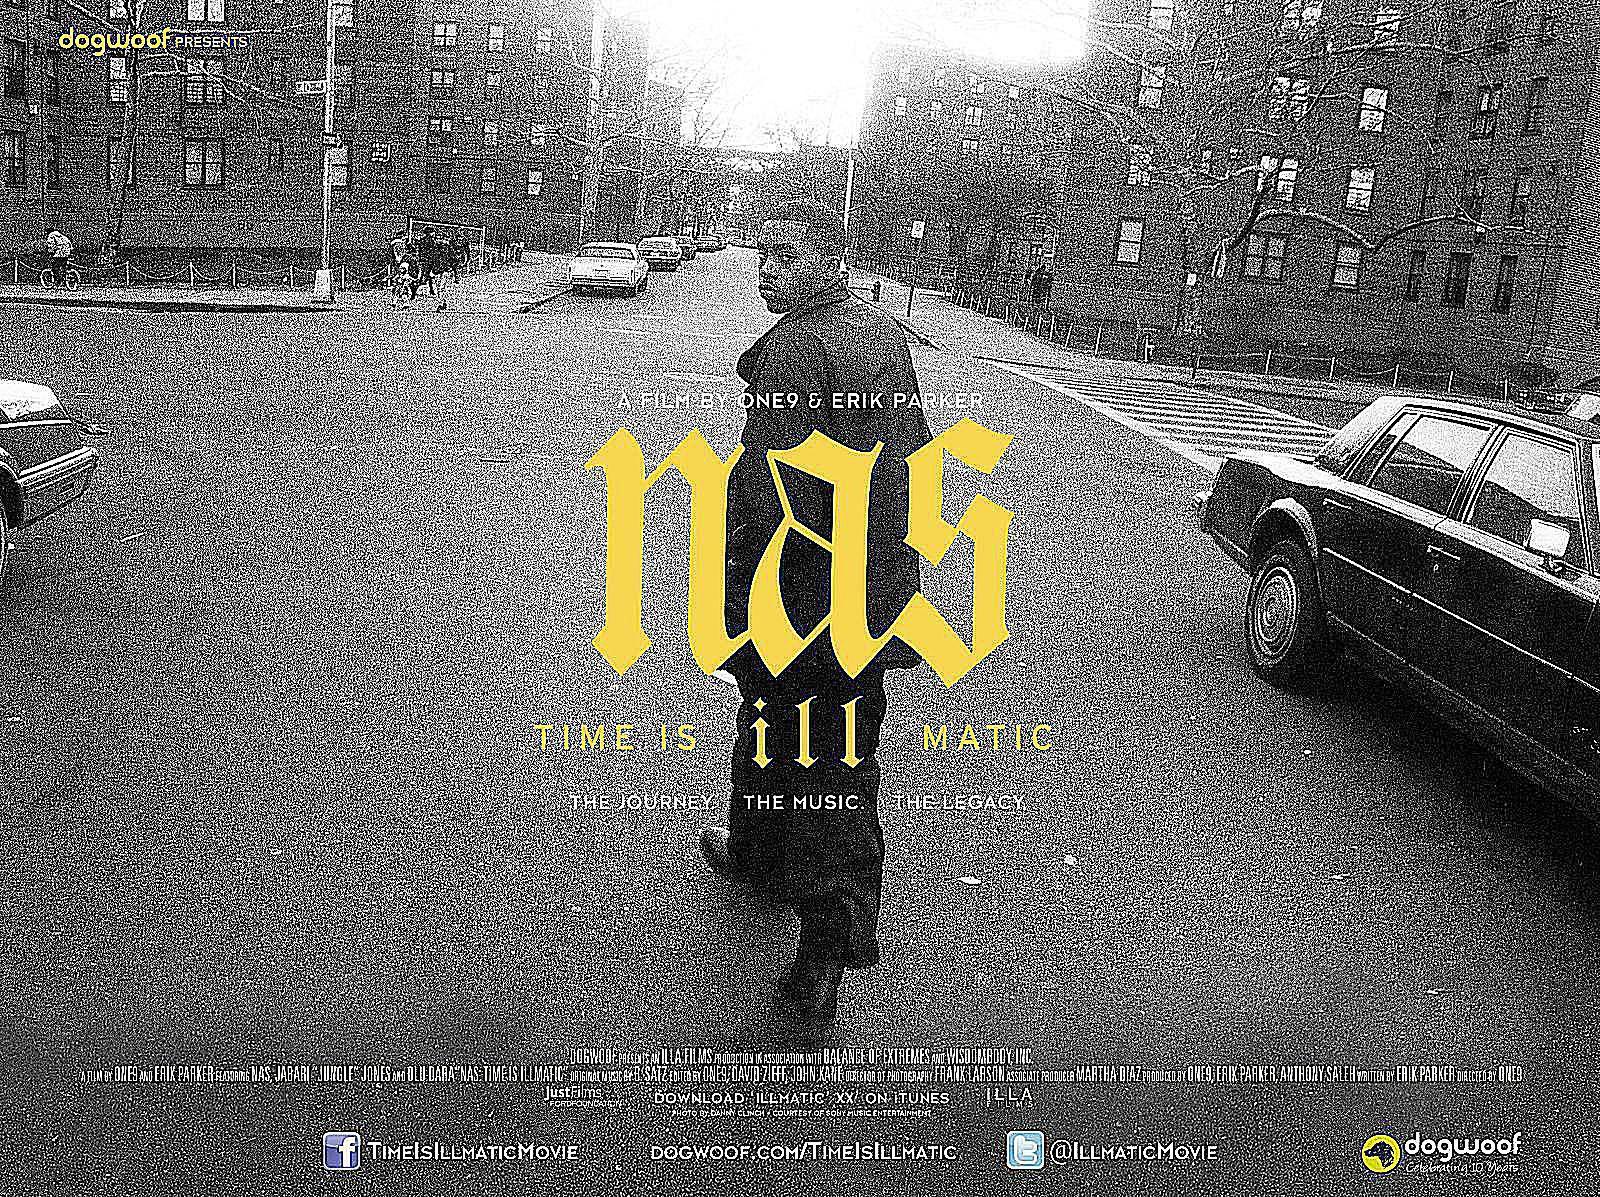 Nas_Time_Is_Illmatic_Dogwoof_Documentary_1600_1197_85.jpg